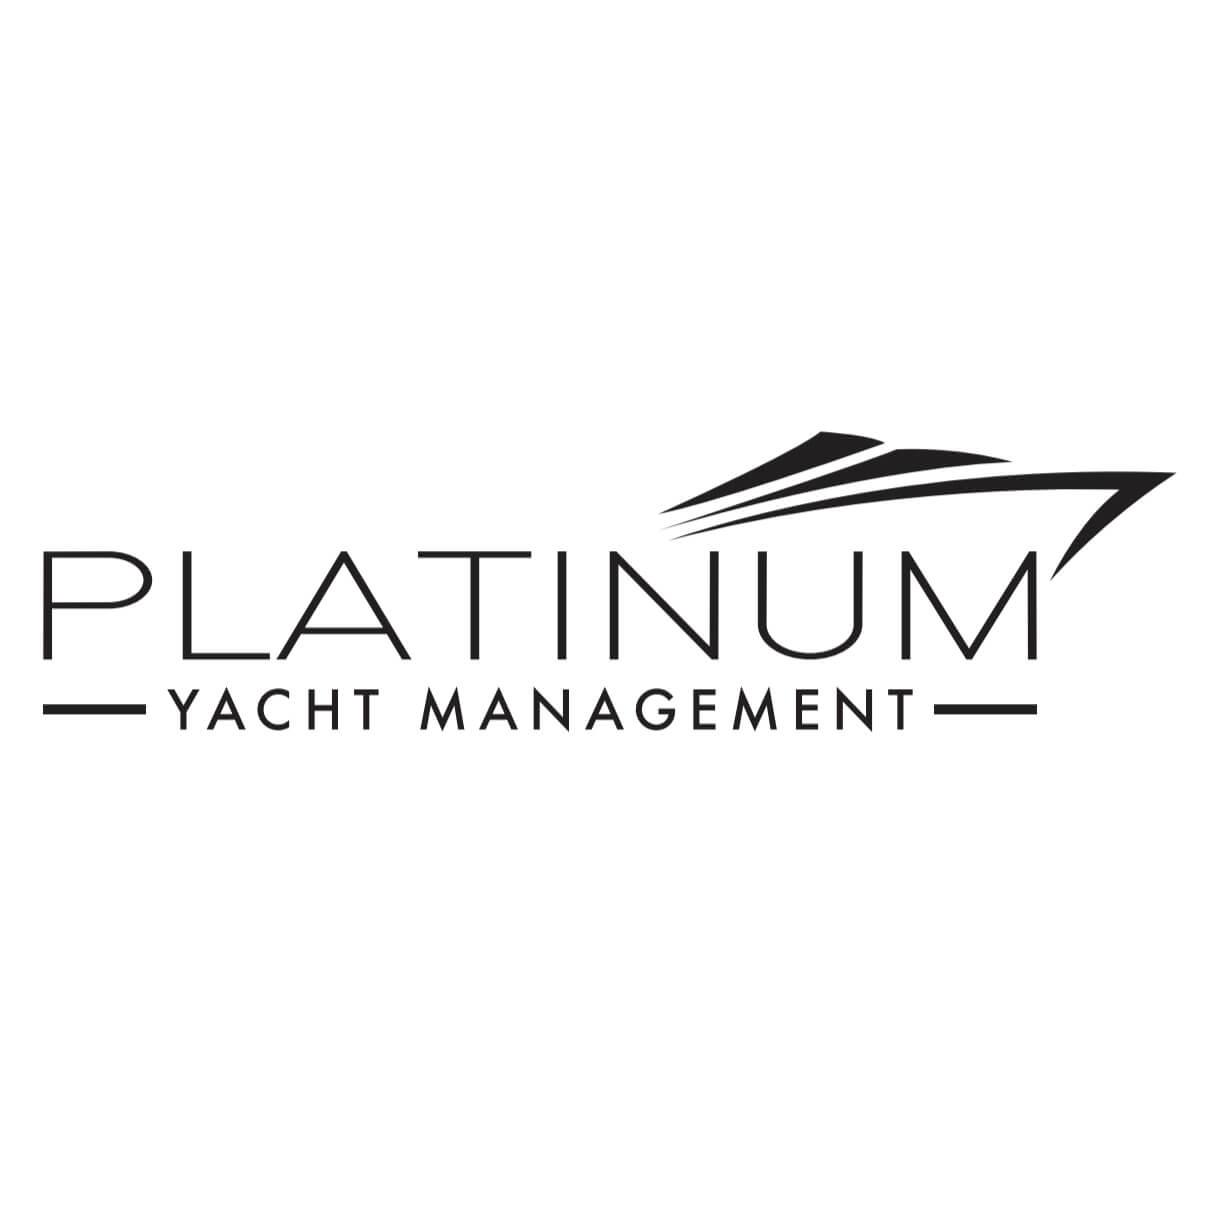 Platinum Yacht Management